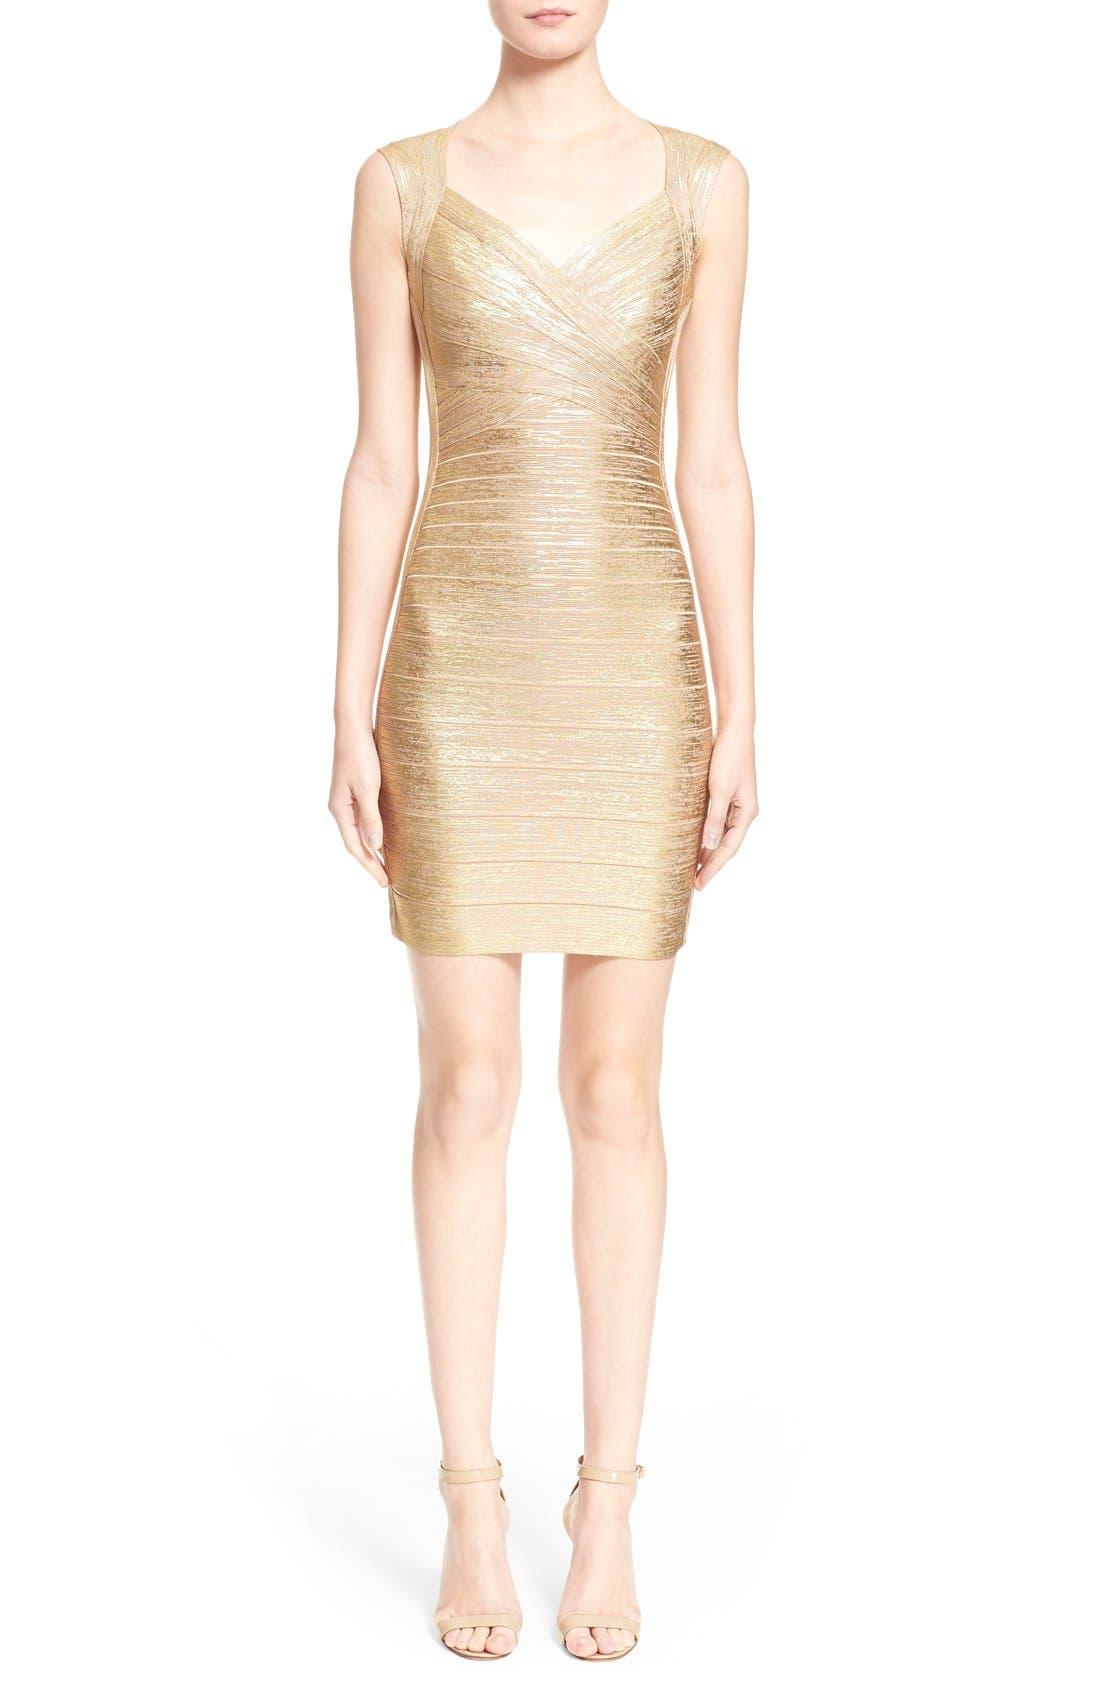 Alternate Image 1 Selected - Herve Leger Metallic Bandage Dress